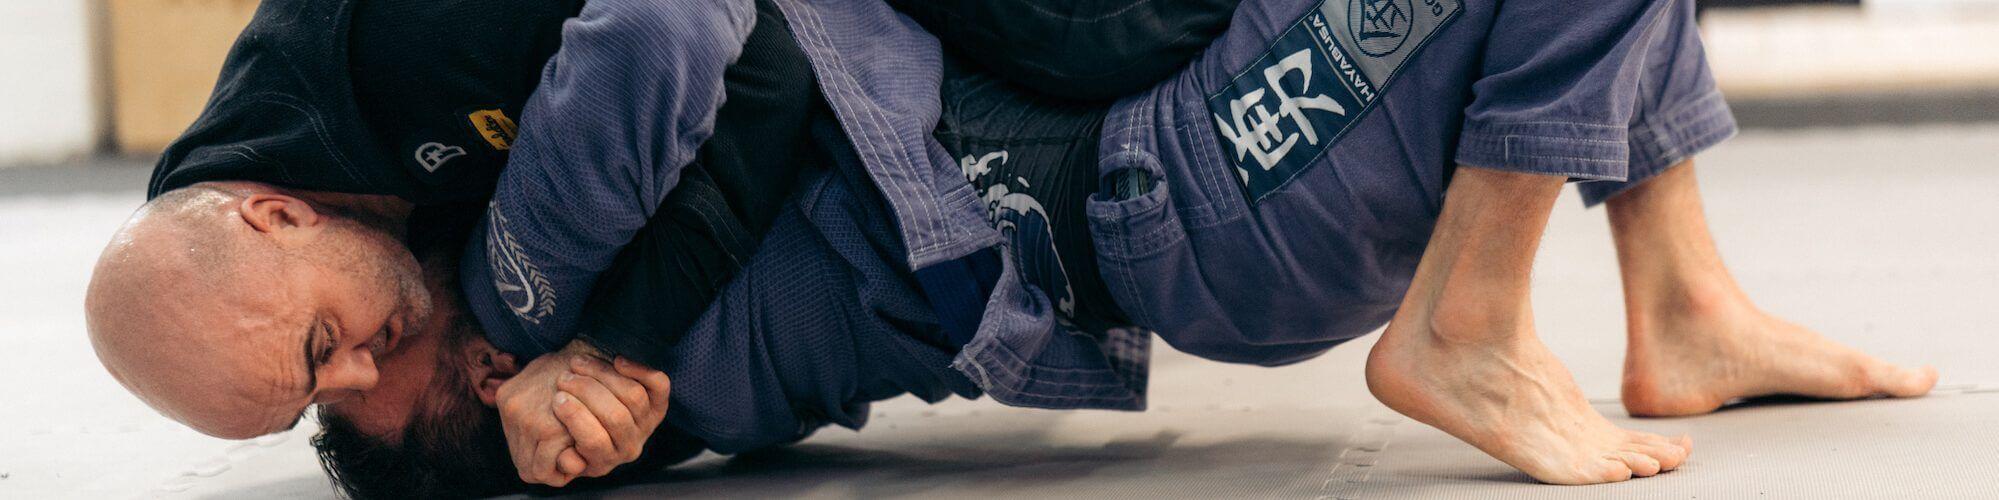 greg and roo head and arm 1999x500 - Brazilian Jiu Jitsu